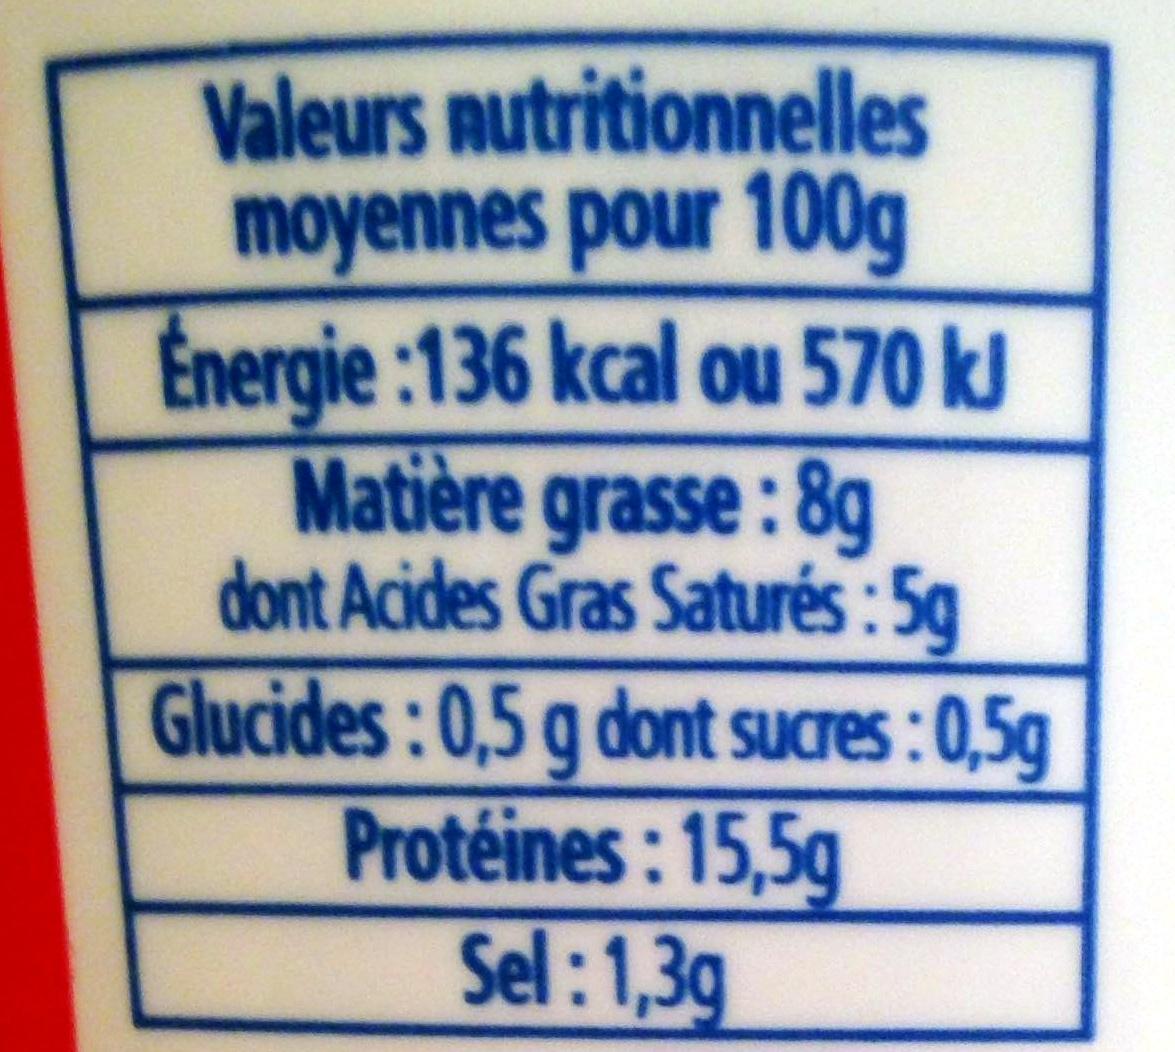 Cancoillotte Ail - Informations nutritionnelles